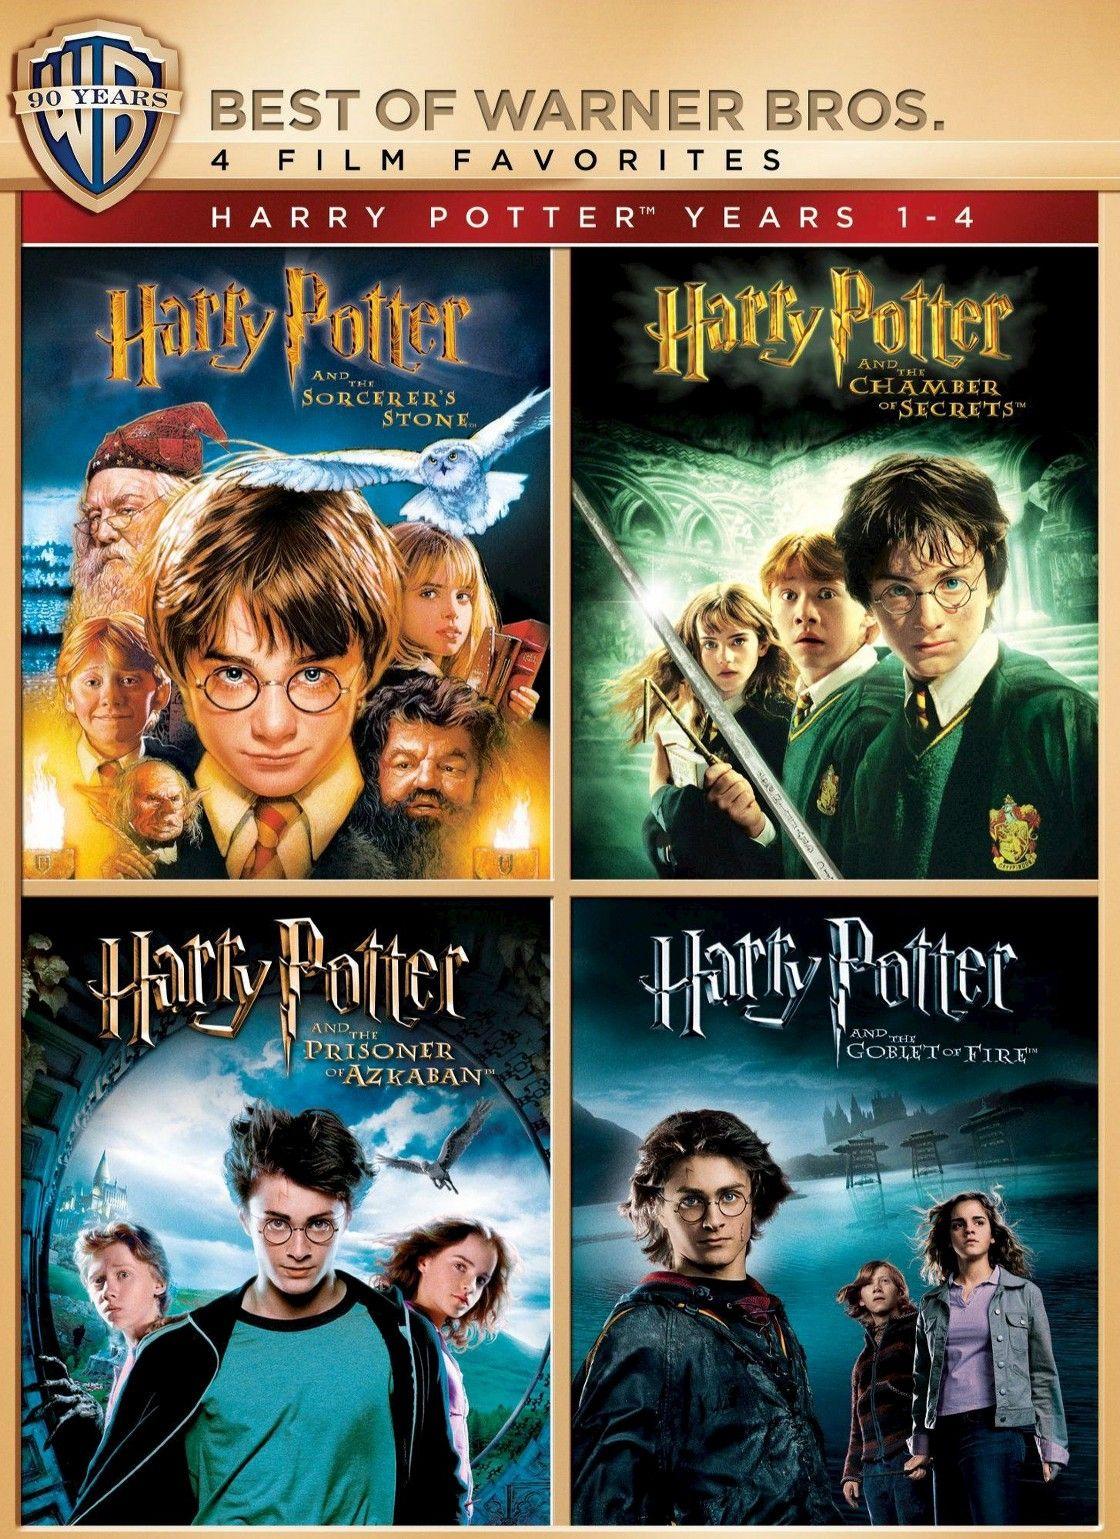 Harry Potter Years 1 4 4 Film Favorites 4 Discs Harry Potter Years Harry Potter Harry Potter Ron